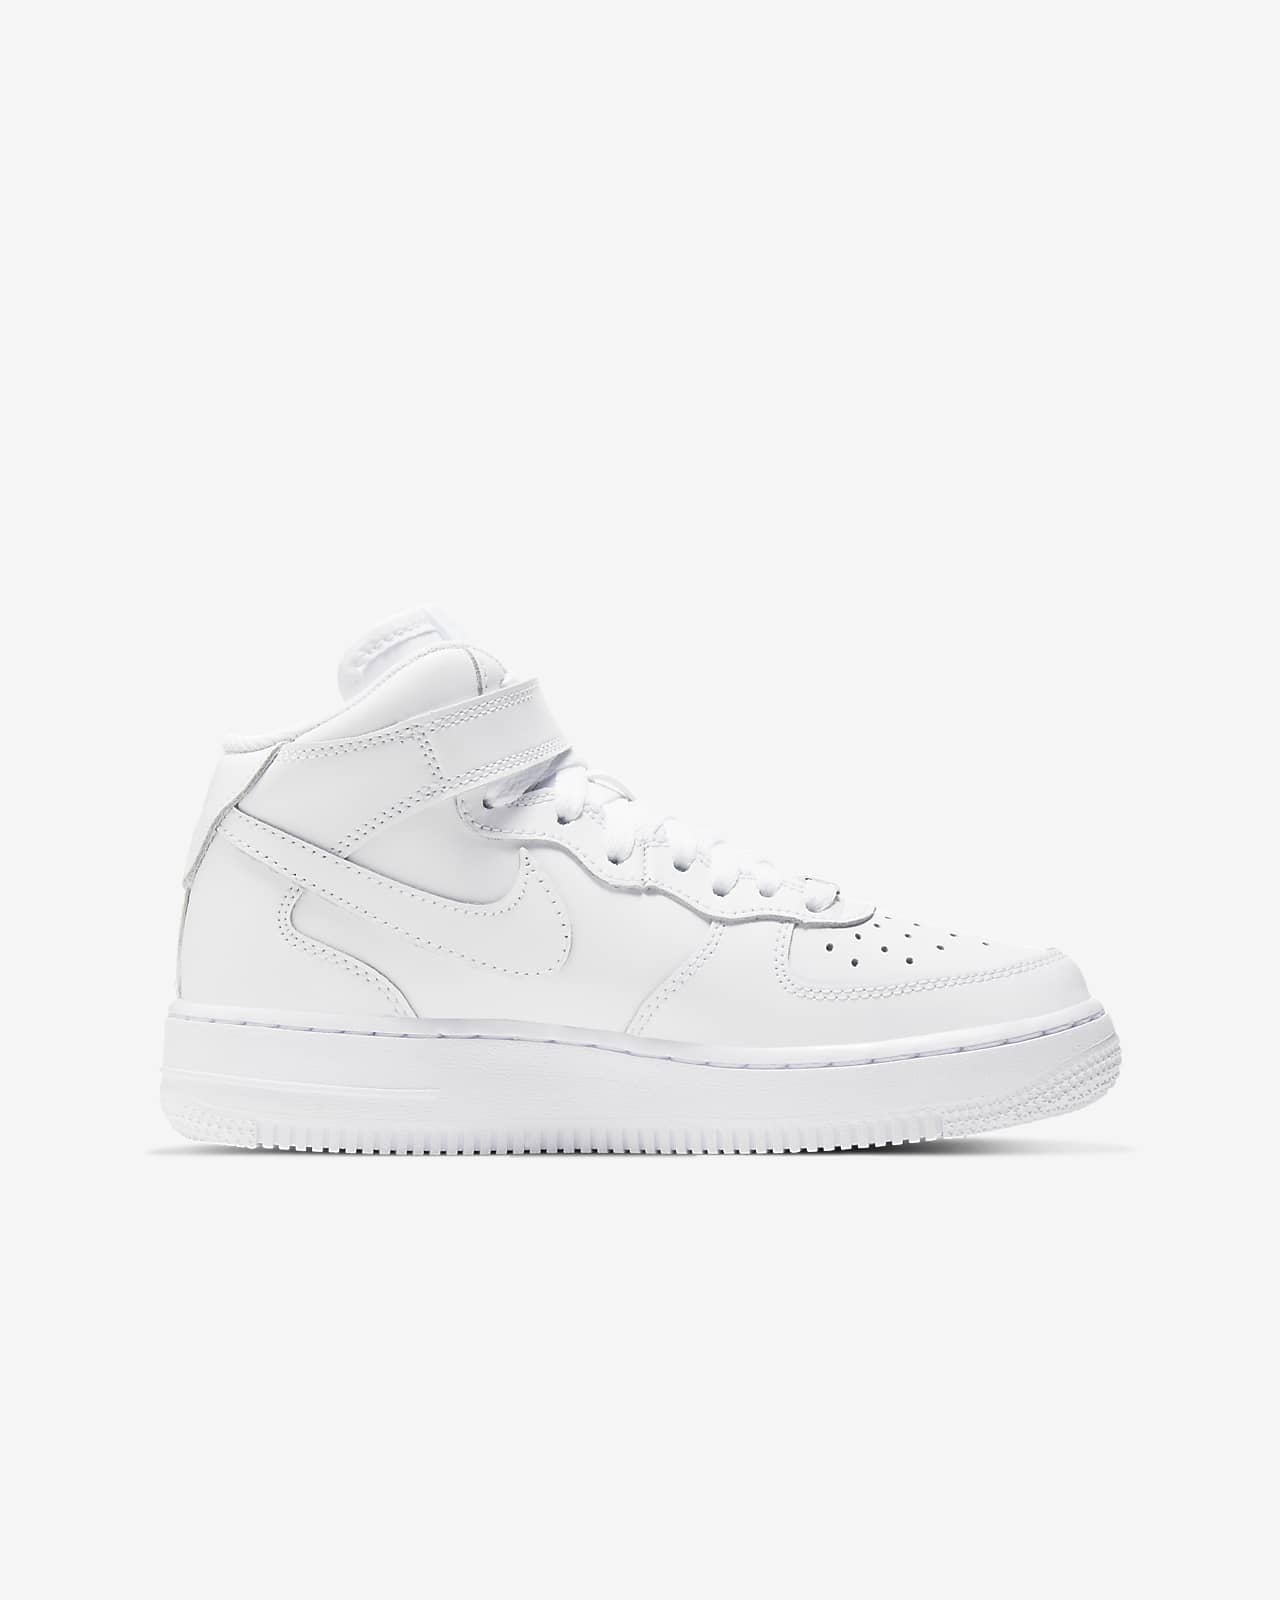 Calzado Para Ninos Talla Grande Nike Air Force 1 Mid Nike Cl